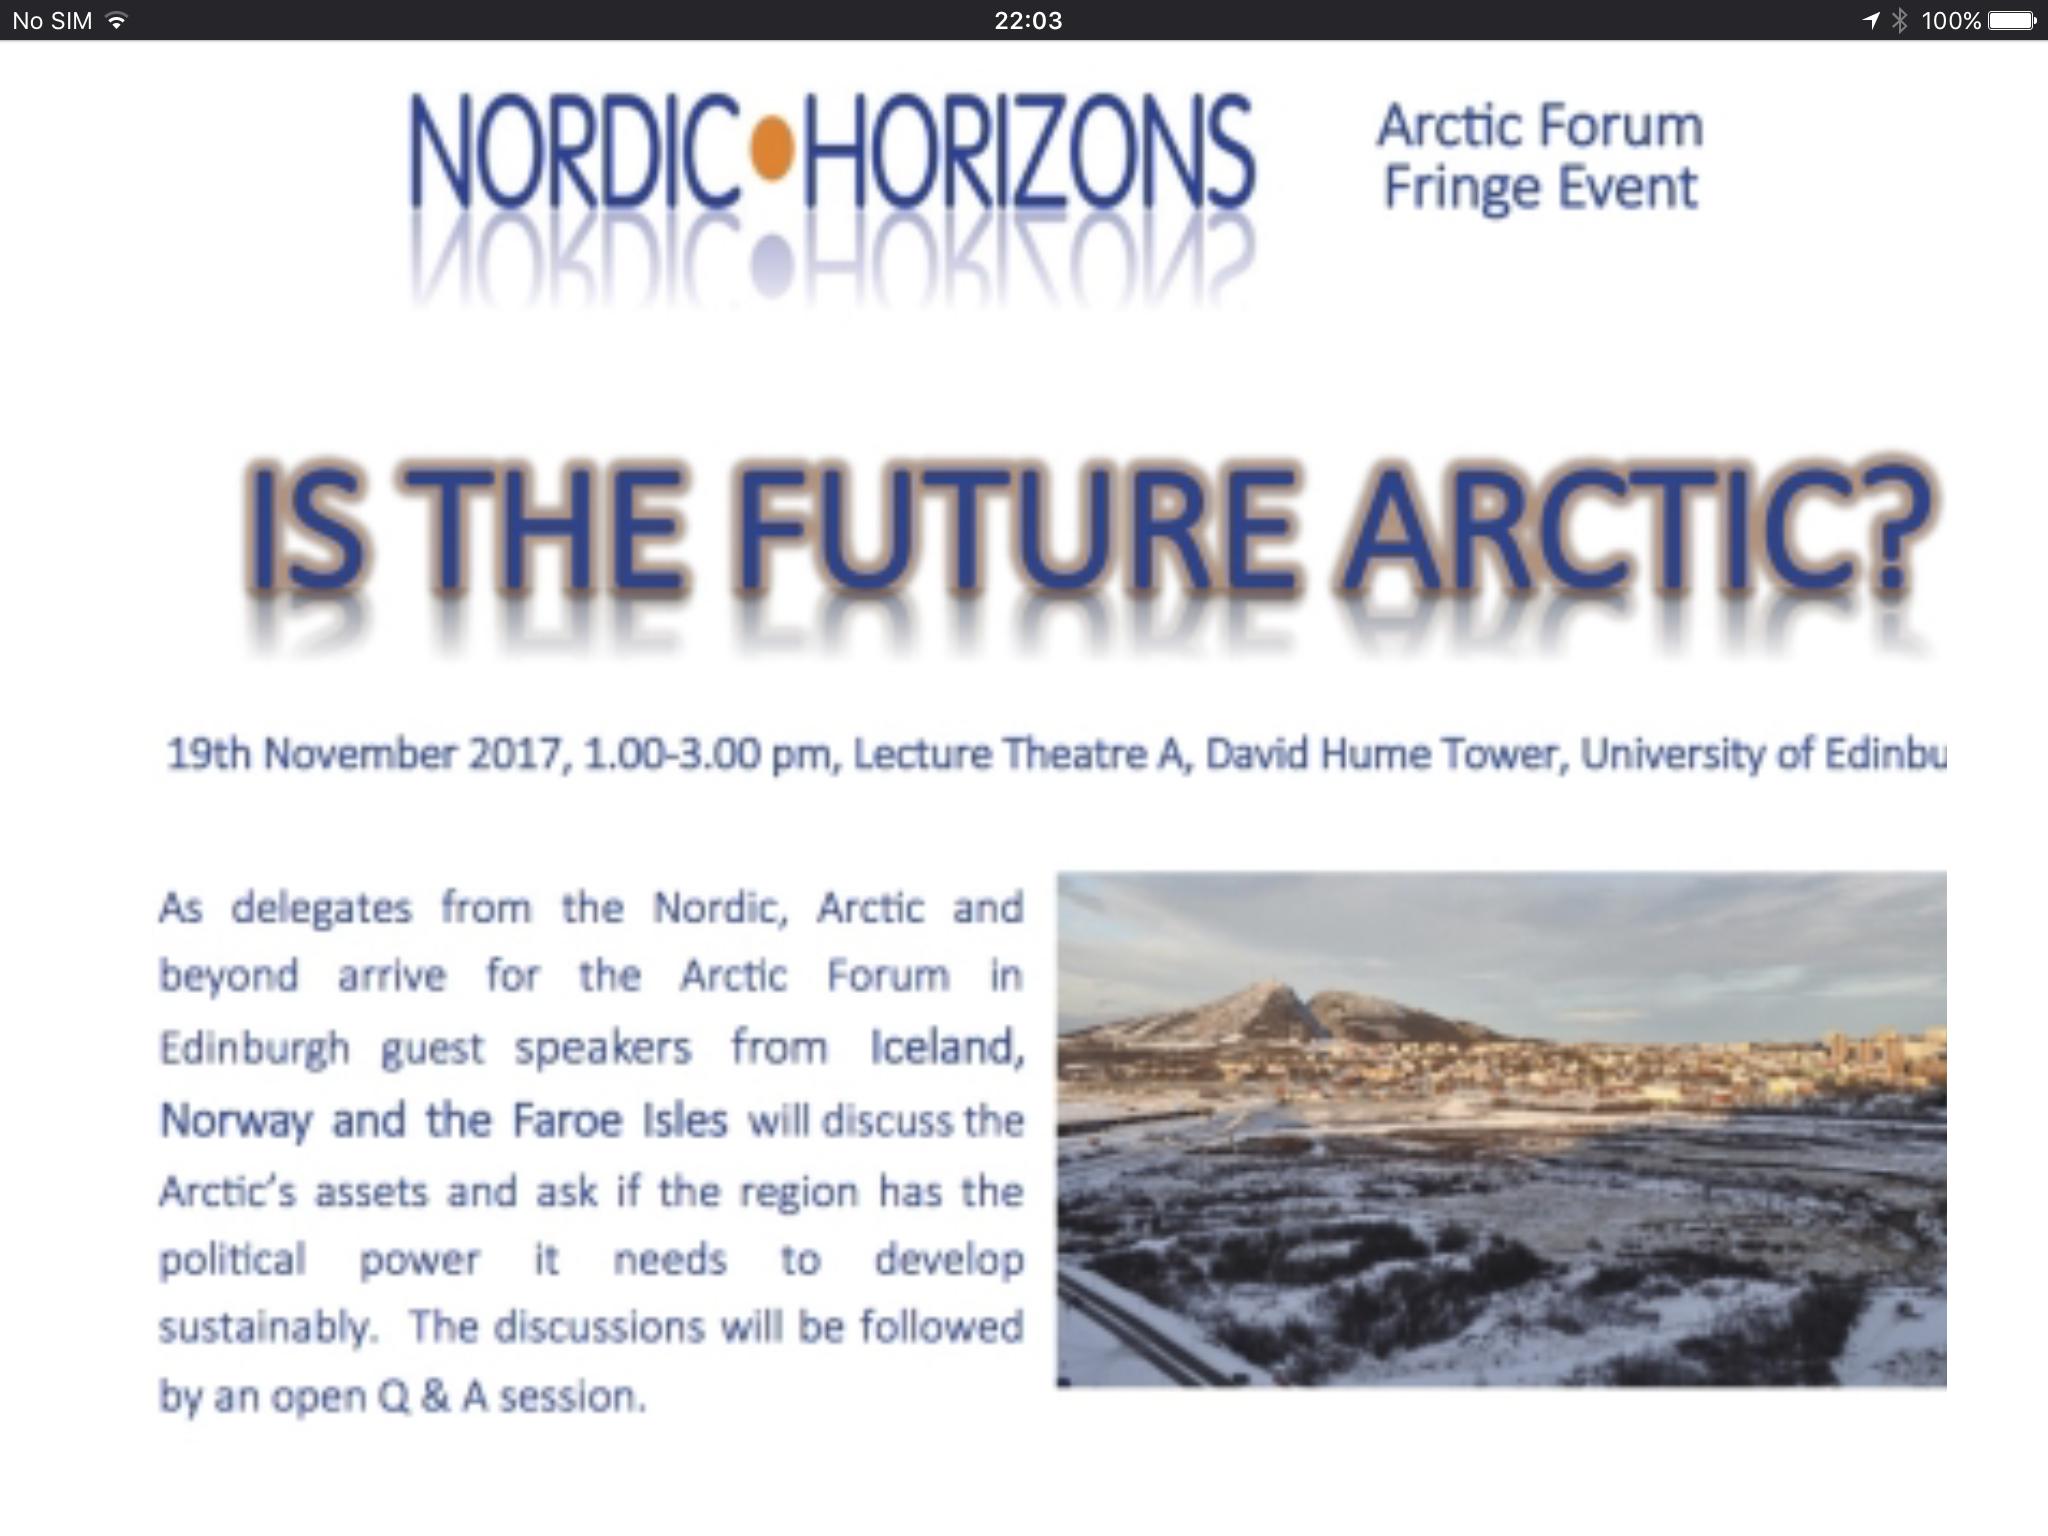 Is the Future Arctic? - Nordic Horizons